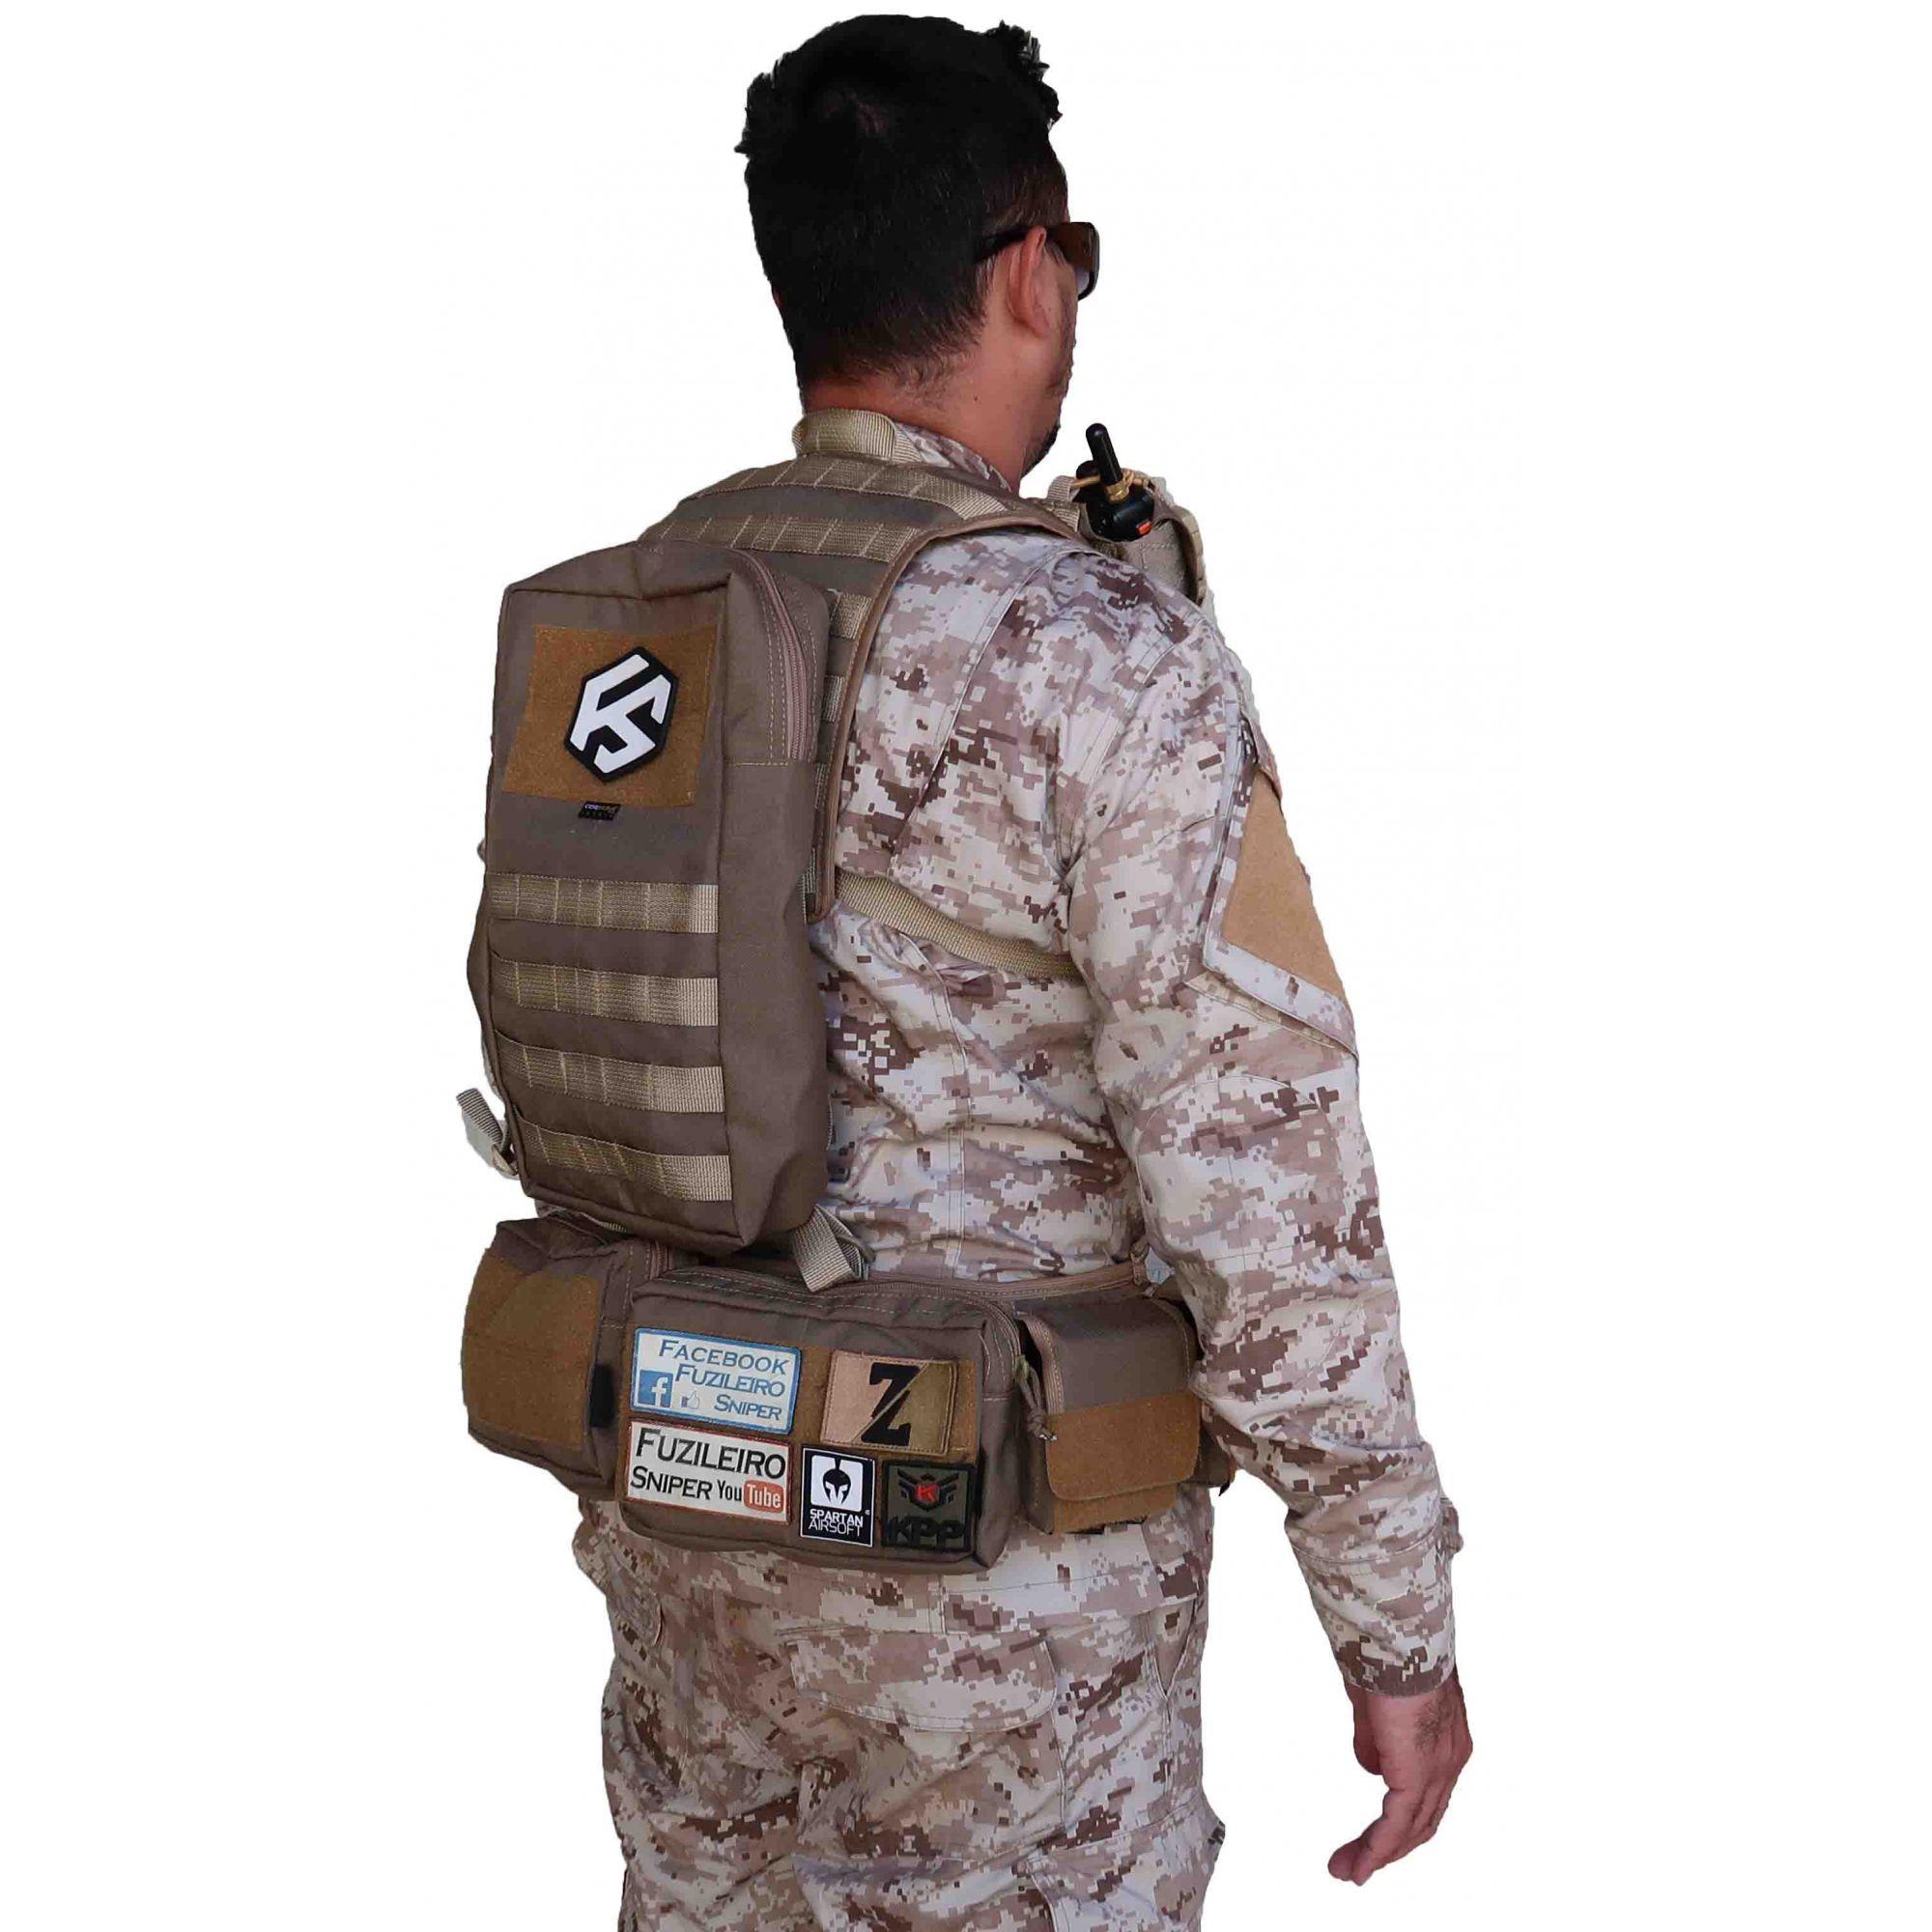 Colete Fuzileiro Sniper Kit Guerra - Pronta Entrega